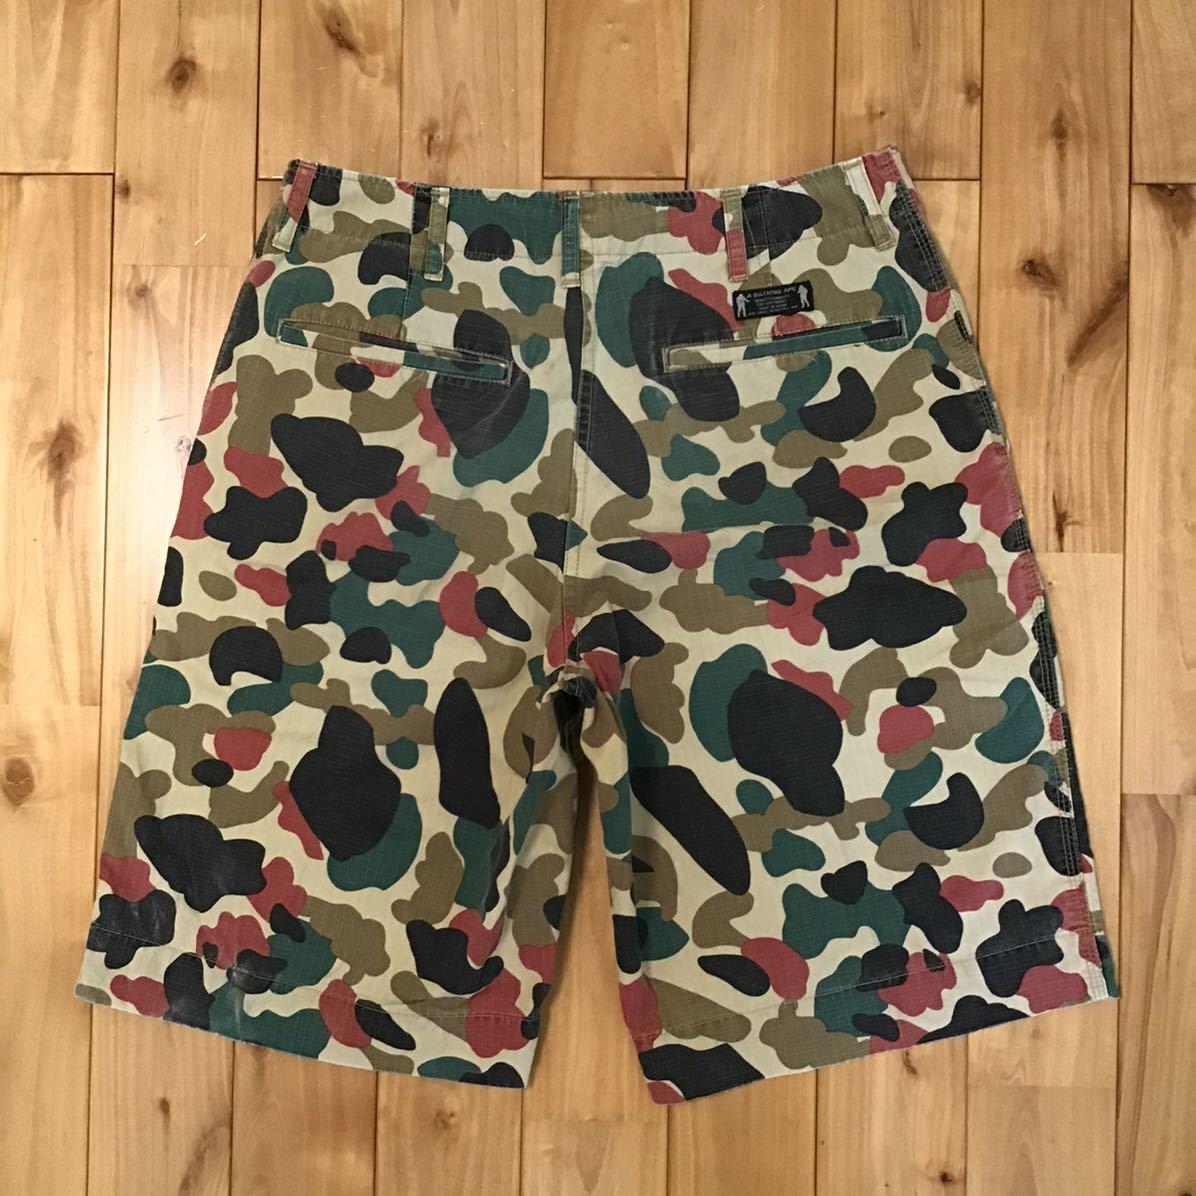 apeman camo ハーフパンツ Mサイズ a bathing ape BAPE shorts ショーツ エイプ ベイプ アベイシングエイプ 迷彩 vintage nigo 325g